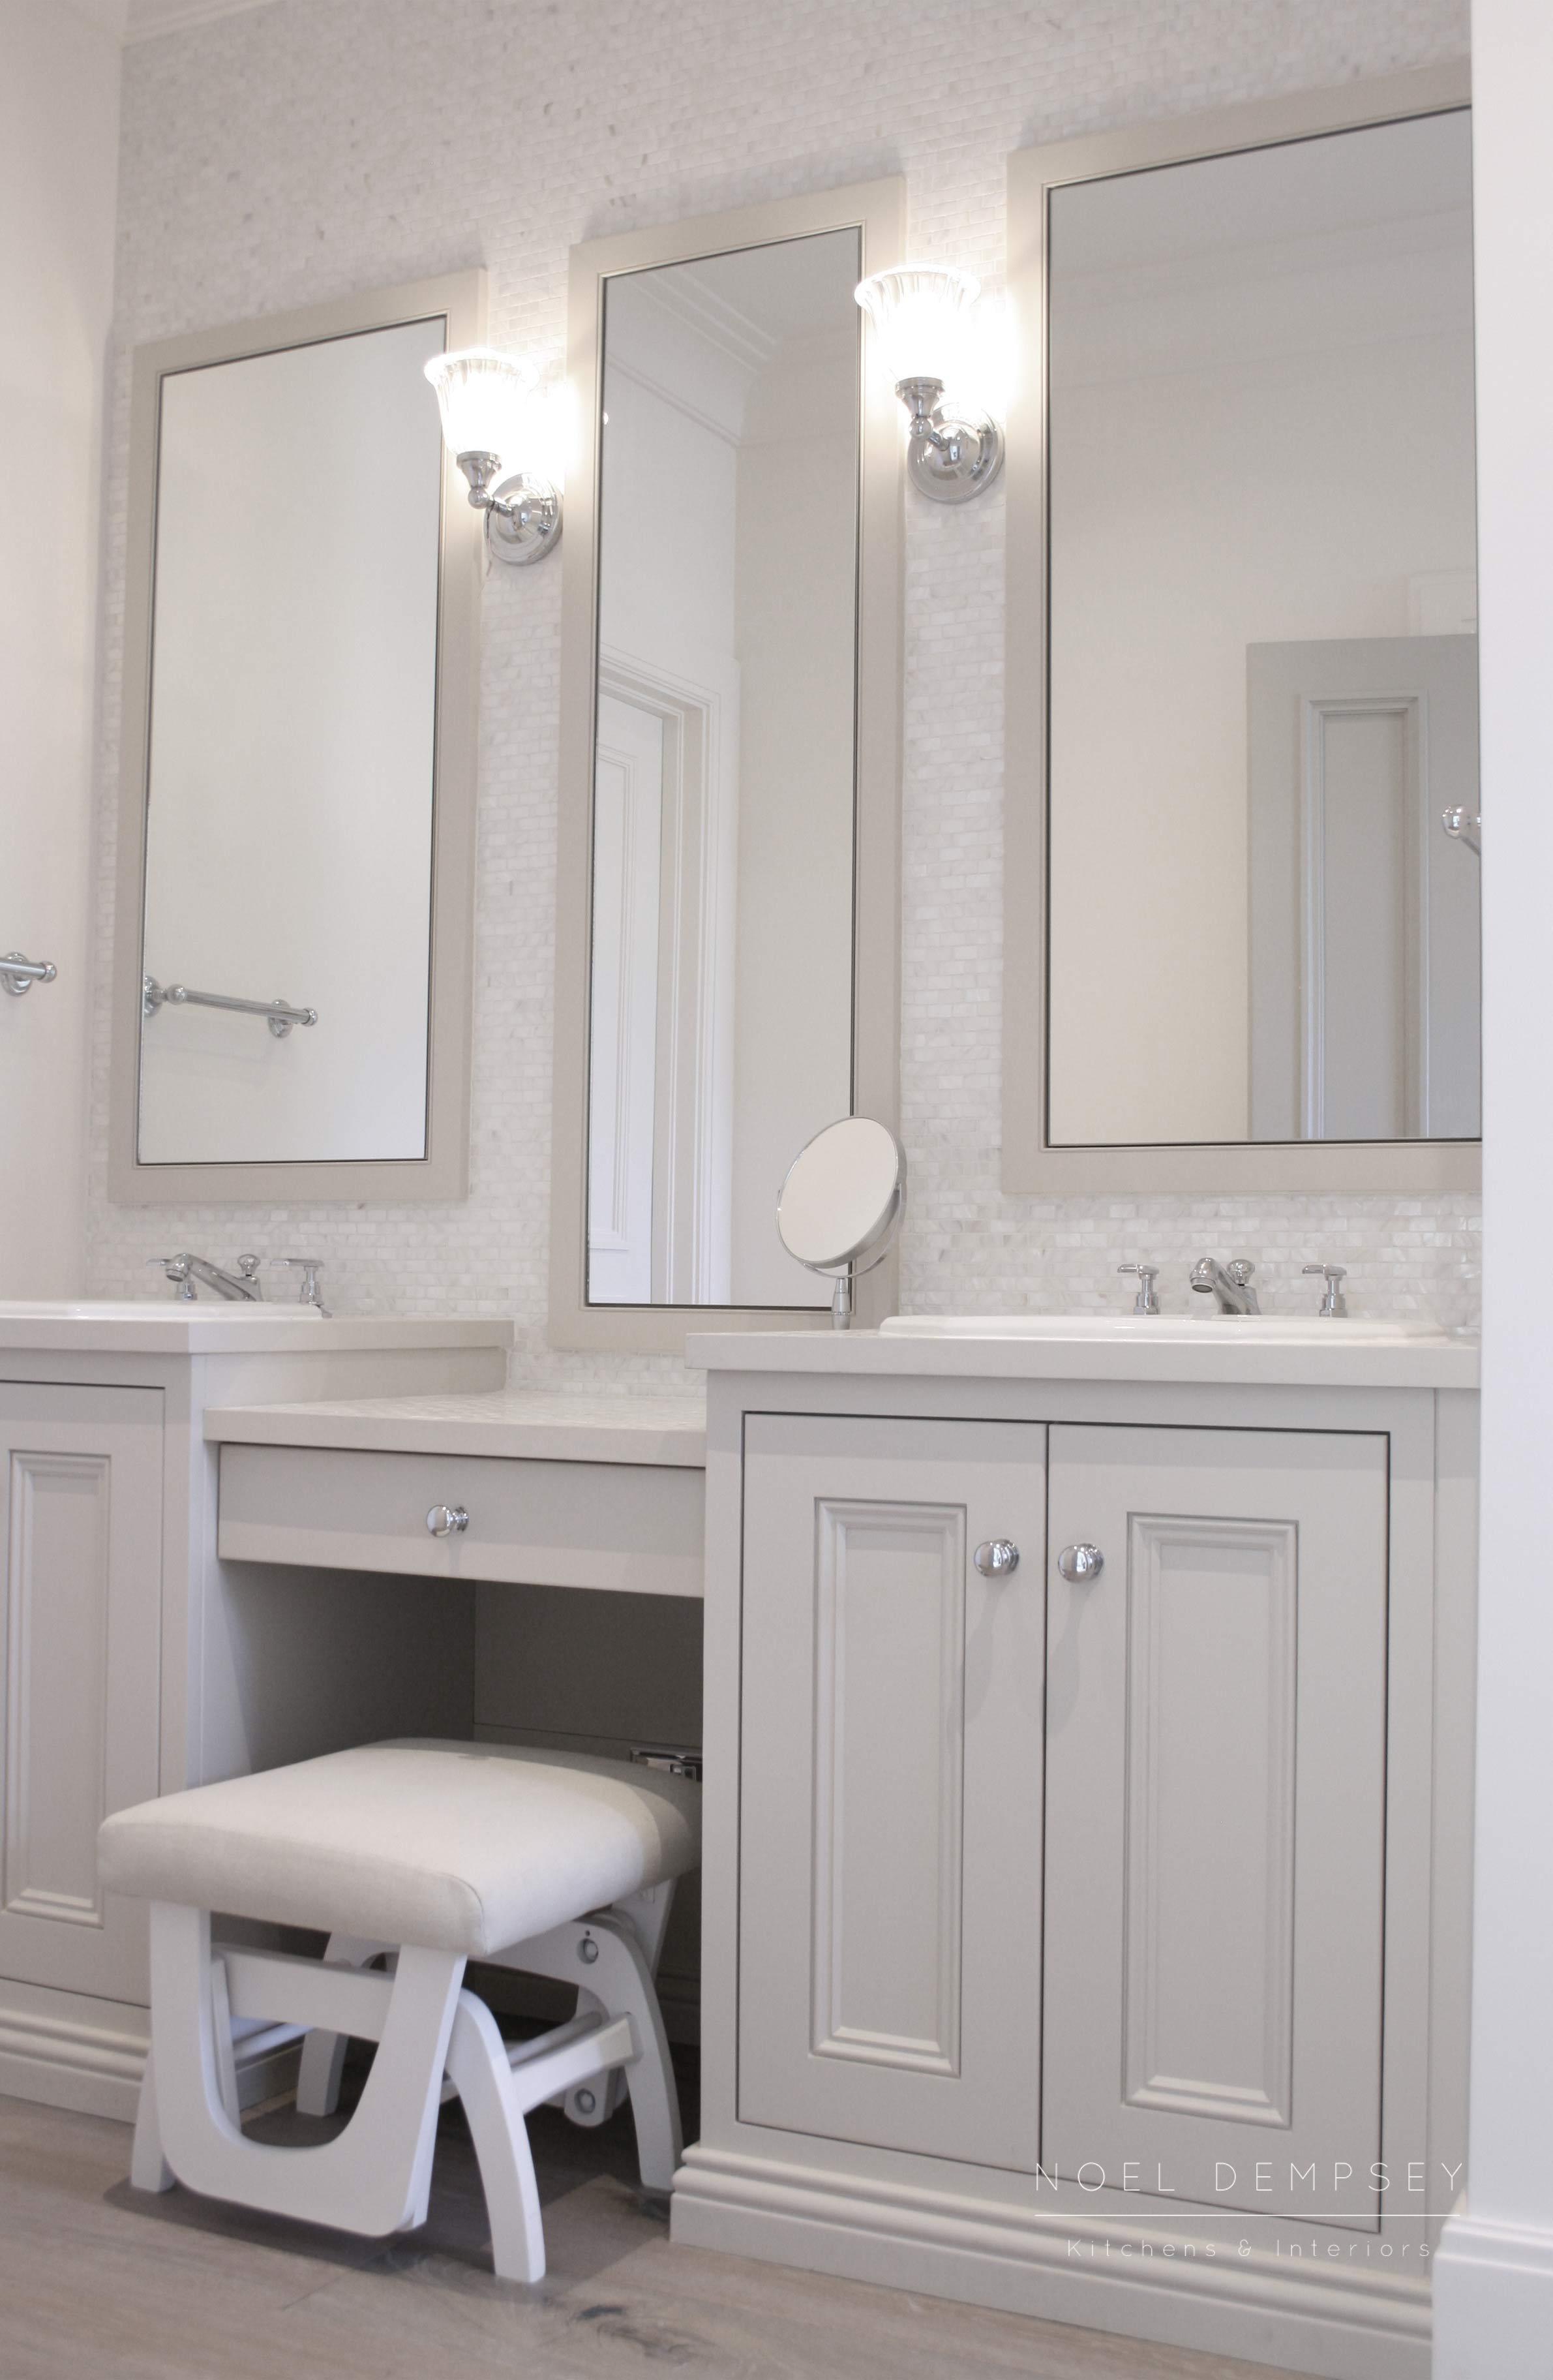 custom-vanity-units-ireland-3.jpg